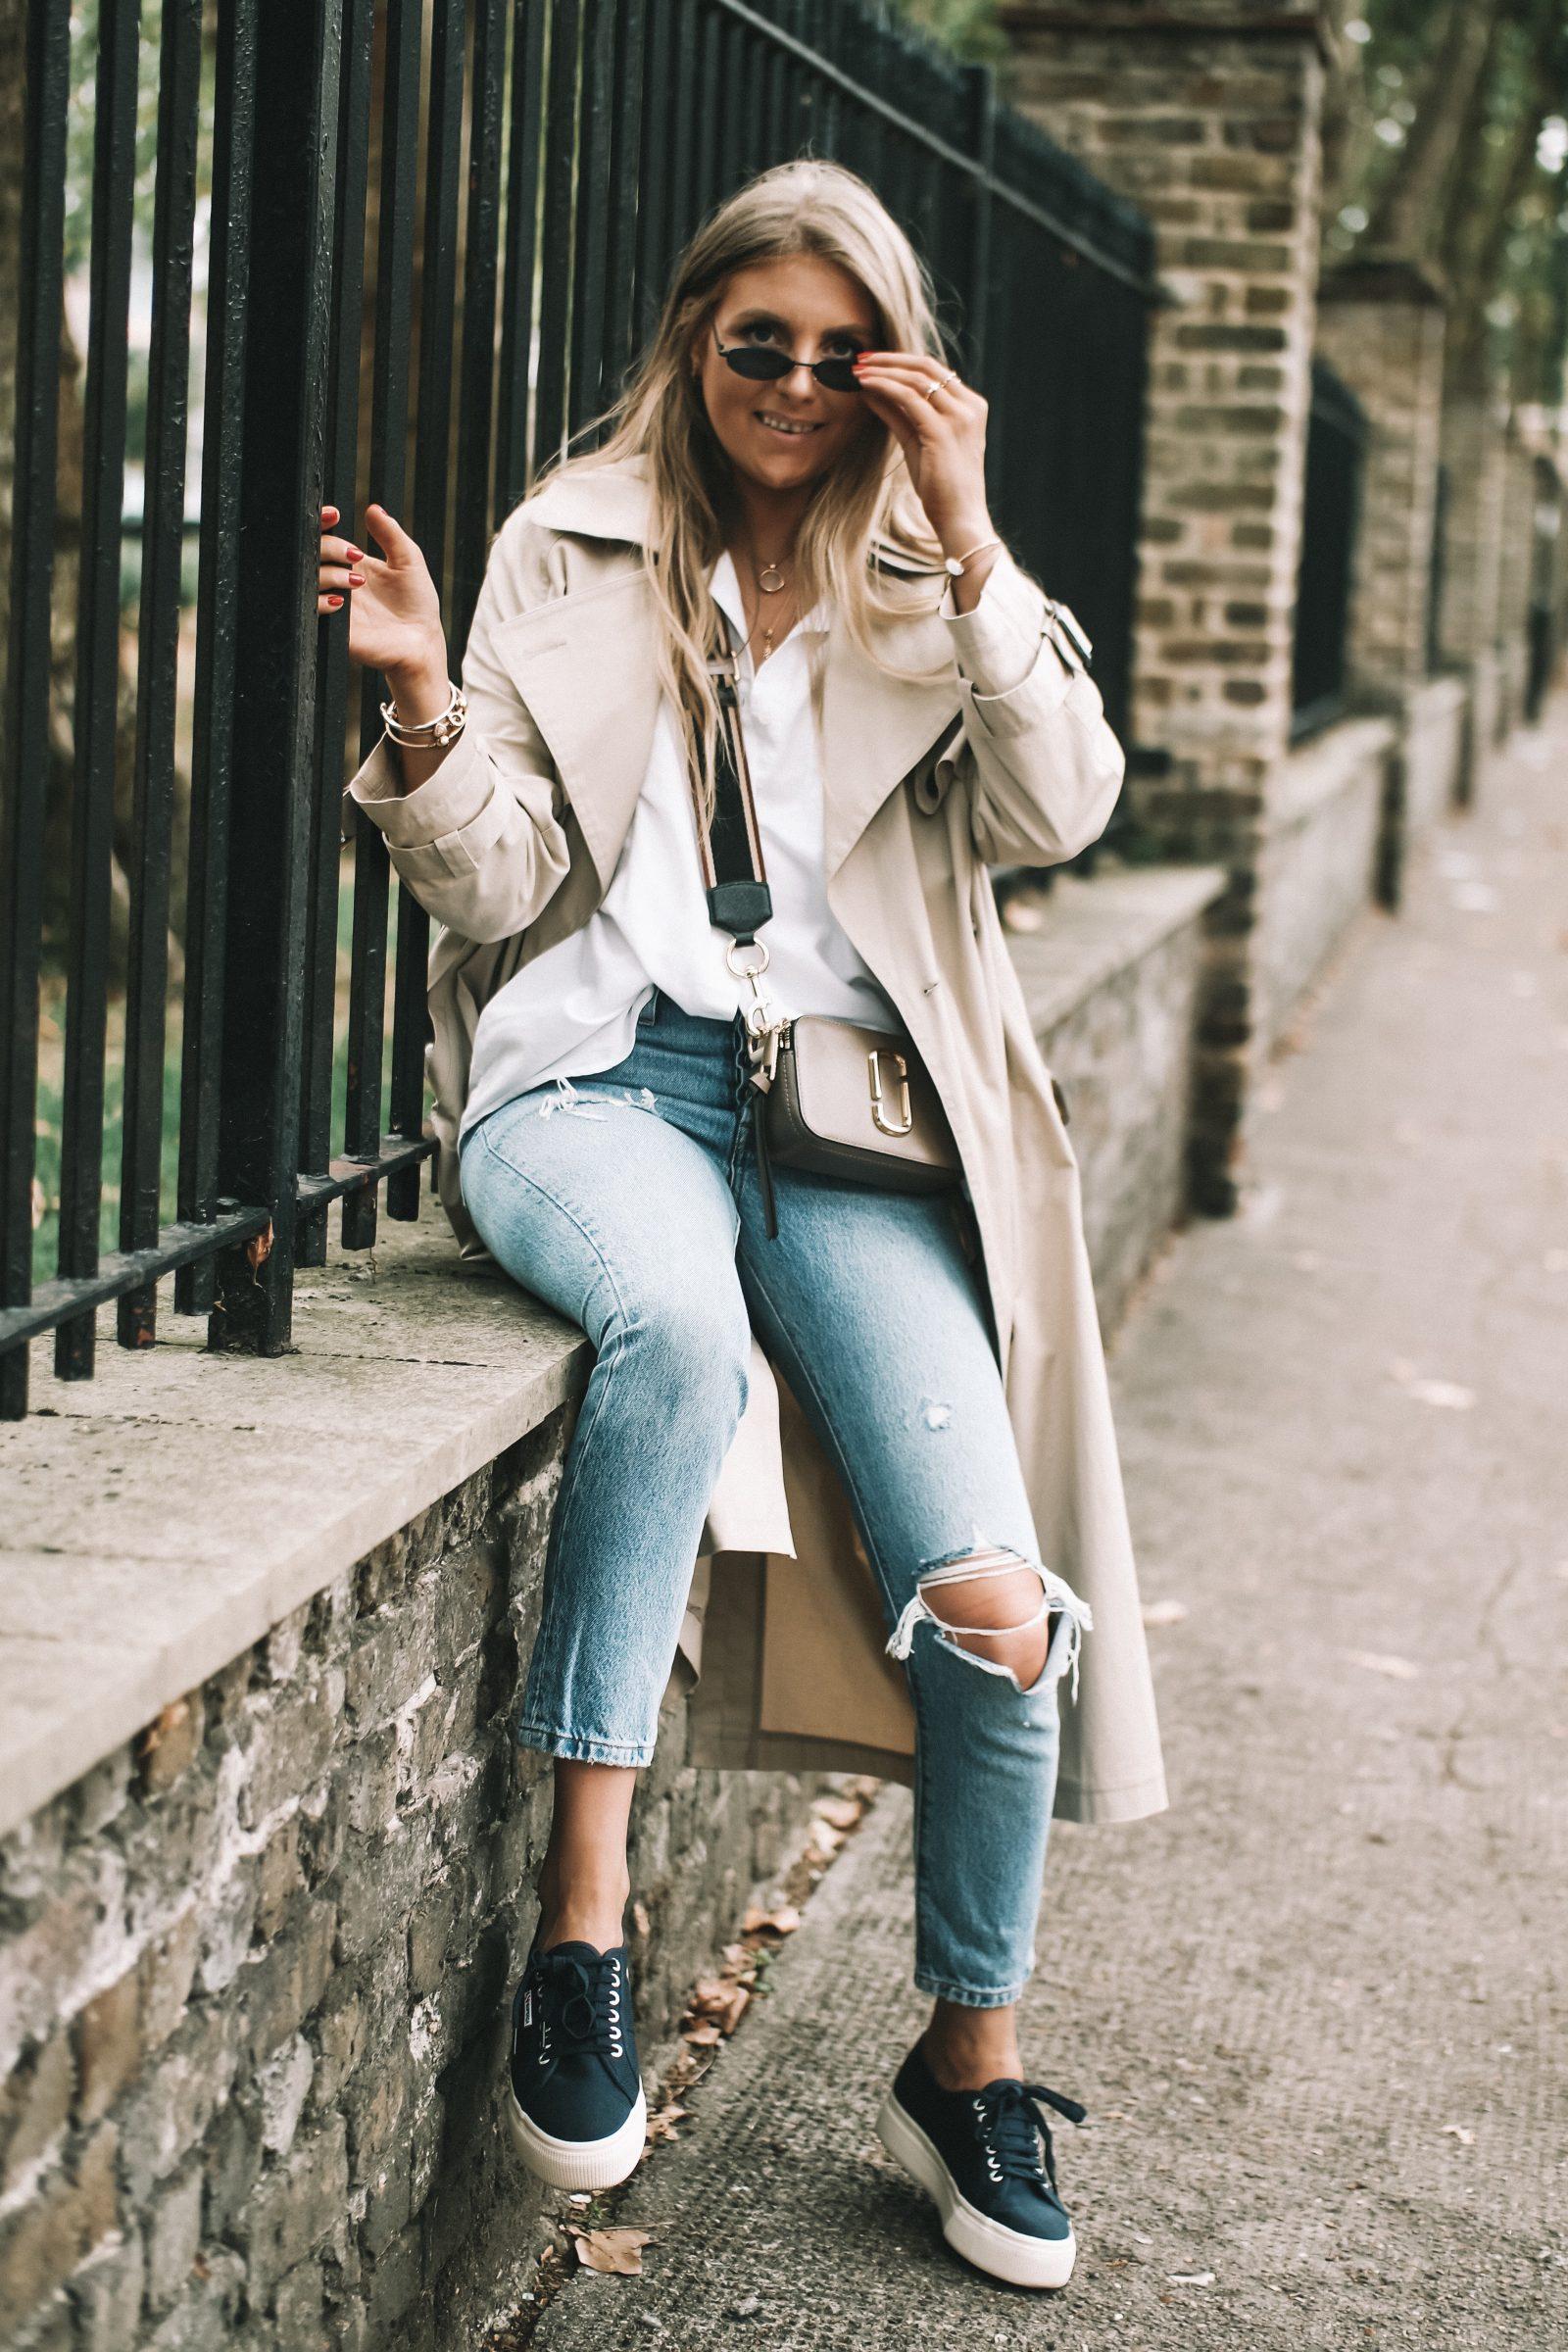 LFW Street Style - September 2018